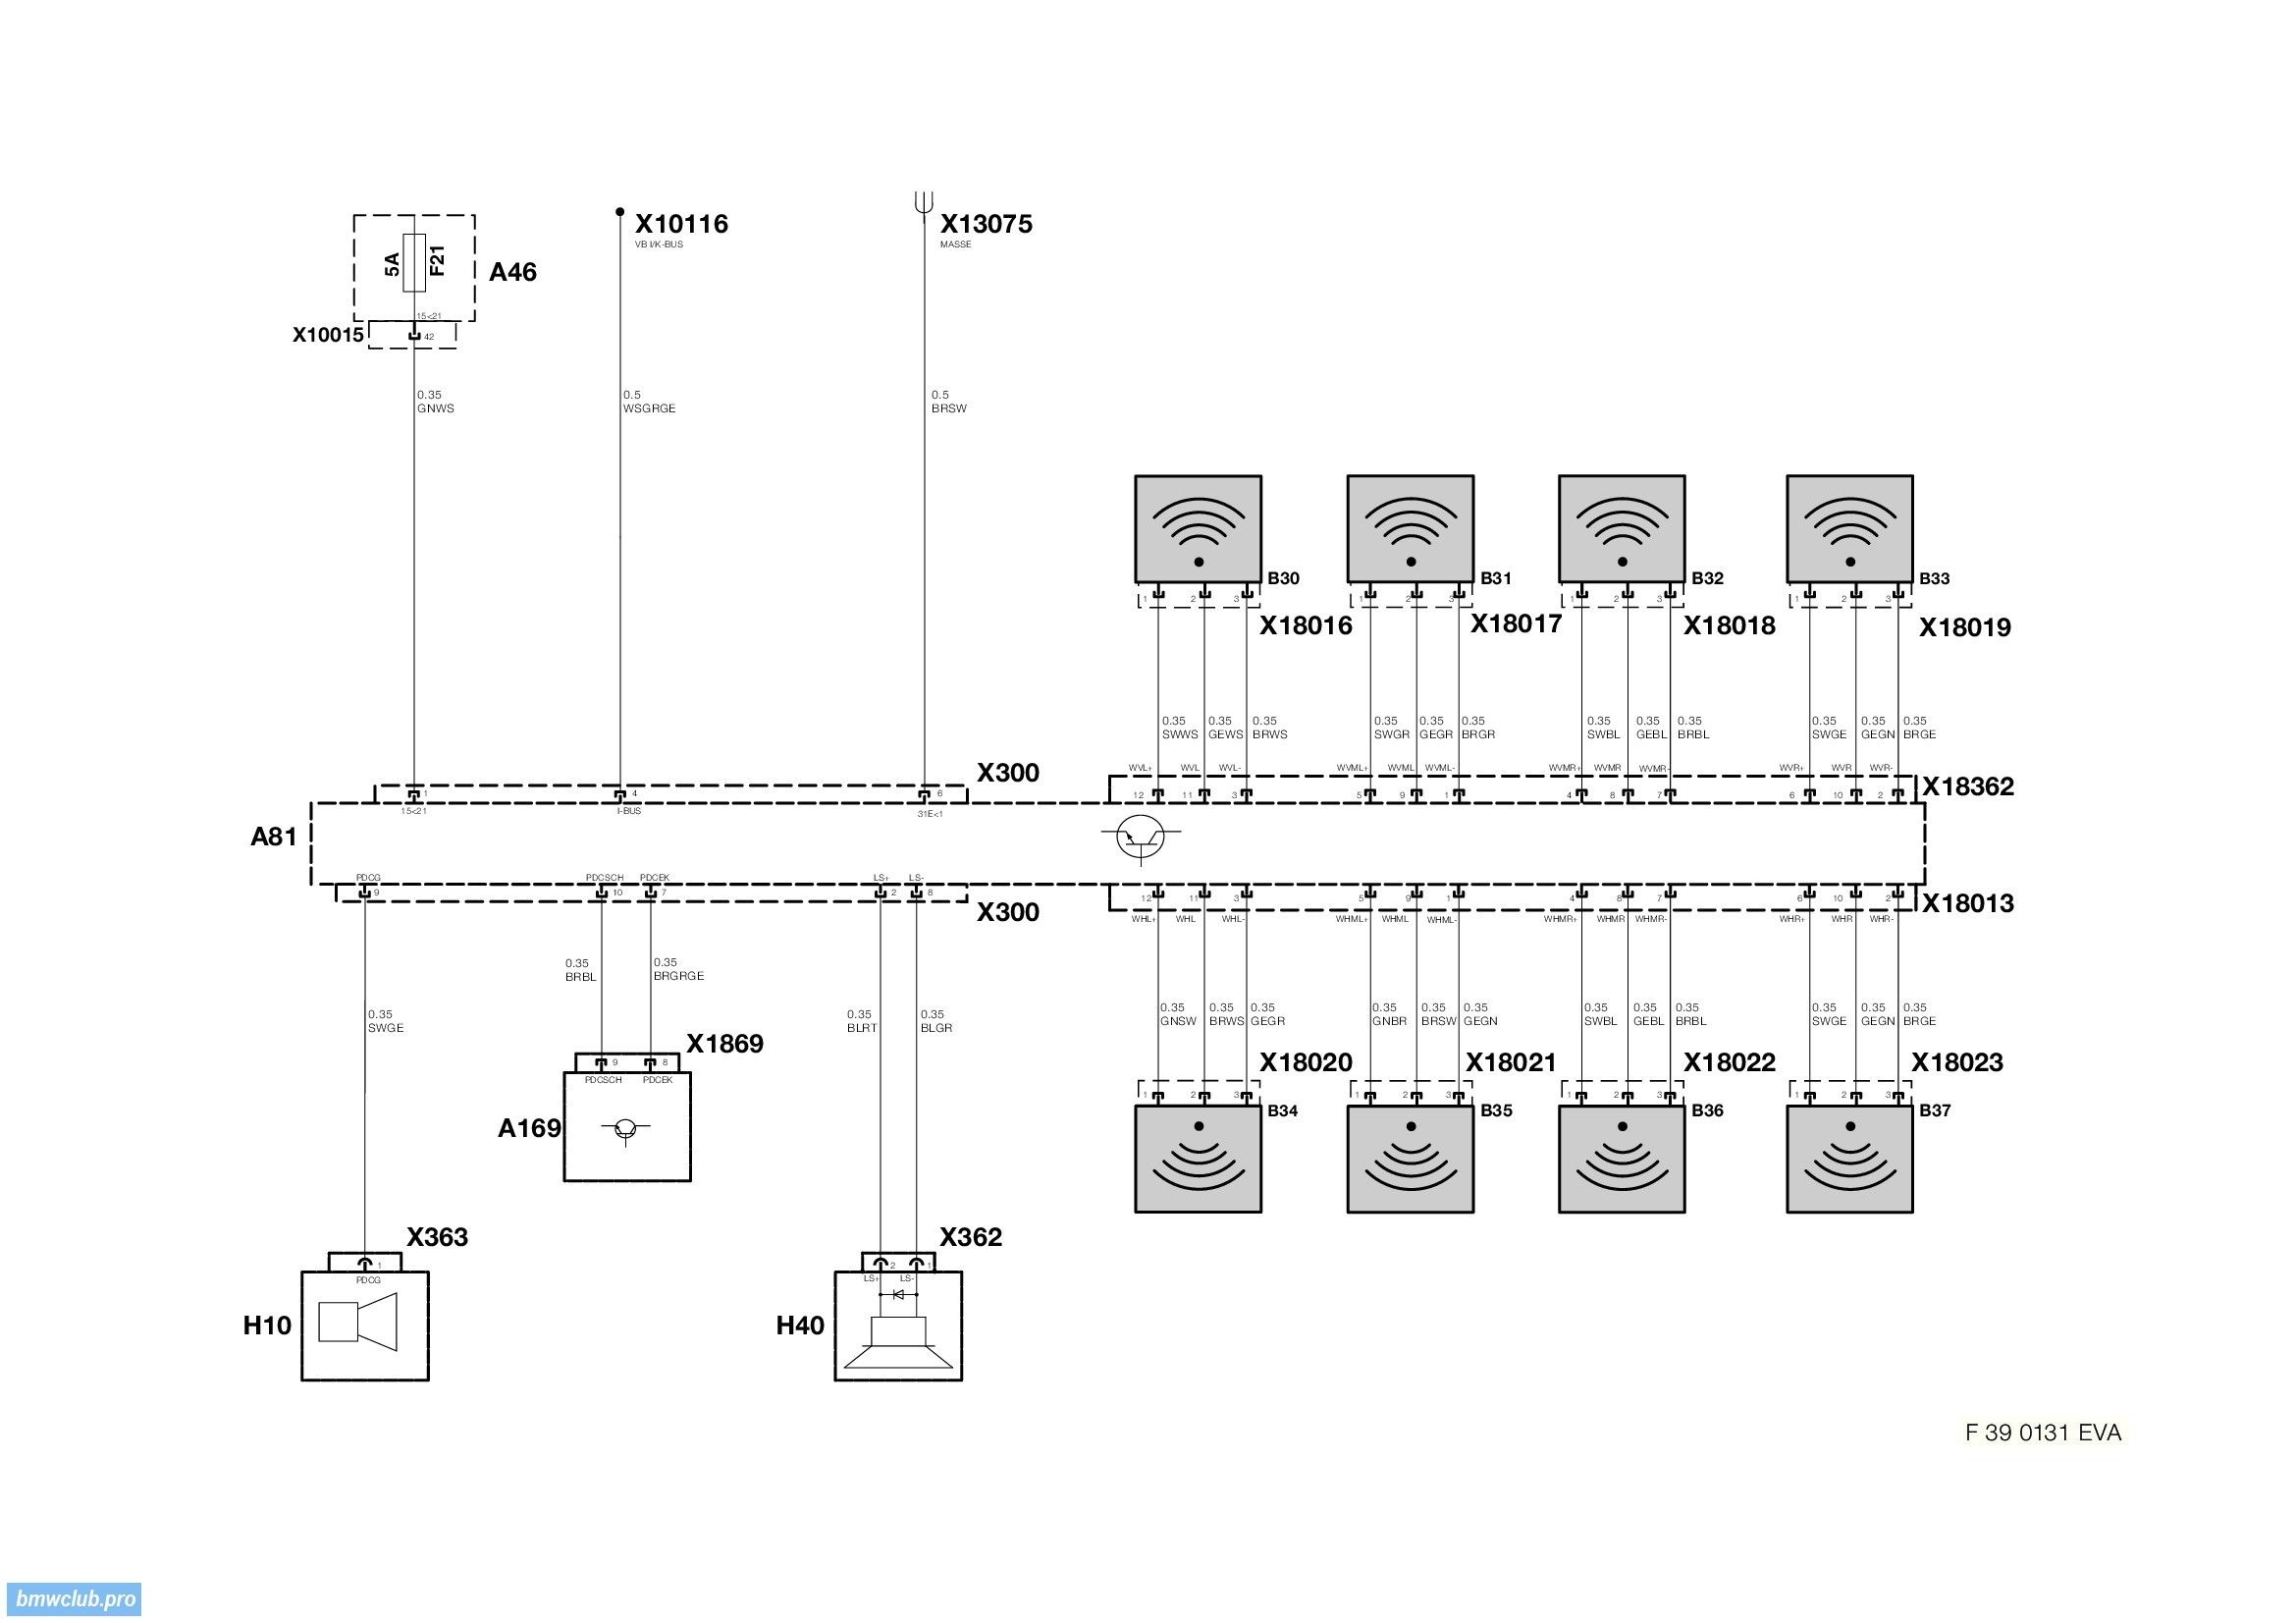 medium resolution of bmw e46 central locking wiring diagram diagram diagramtemplate bmw e46 central locking wiring diagram diagram diagramtemplate